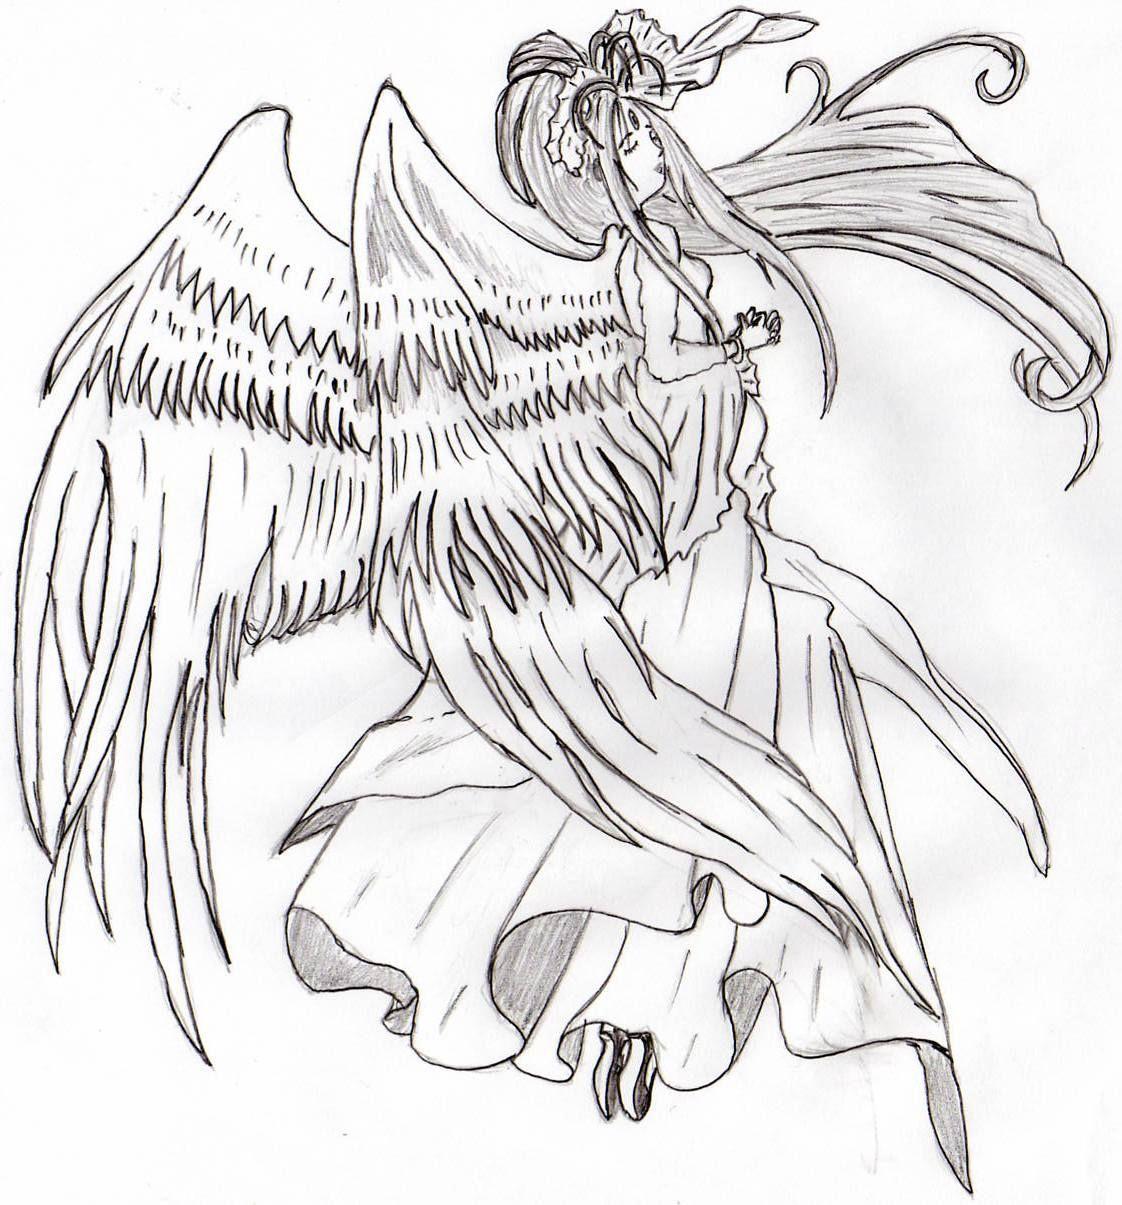 F e manga coloriage recherche google dessins mangas pinterest dessin coloriage et manga - Manga coloriage elfe ...